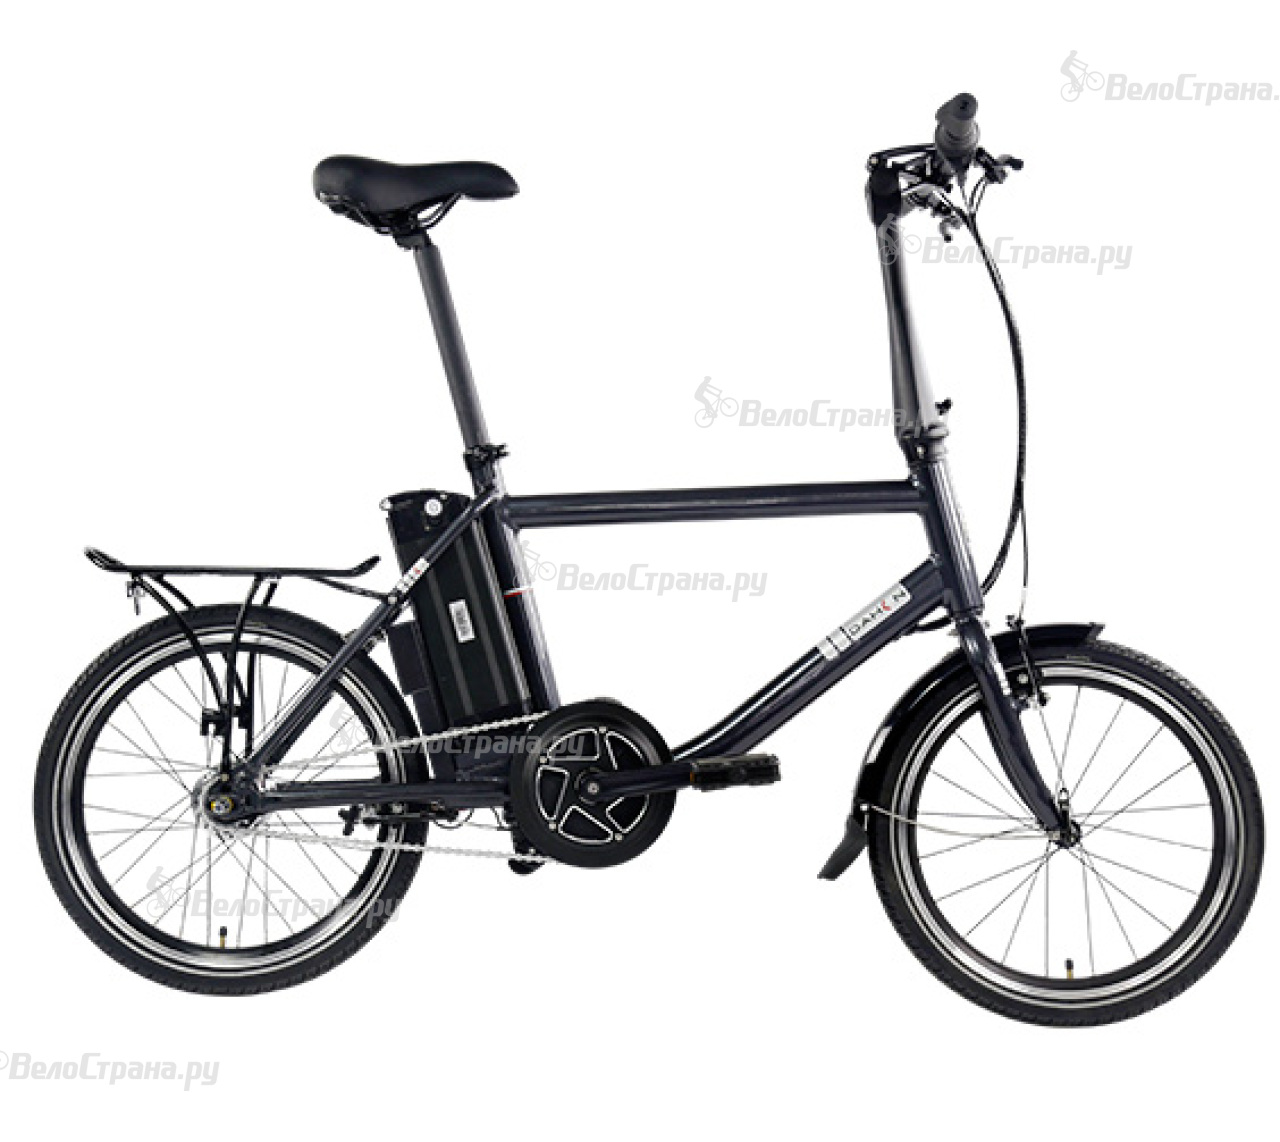 Велосипед Dahon Compact ES i7 (2017) велосипед dahon vybe d7 u 2017